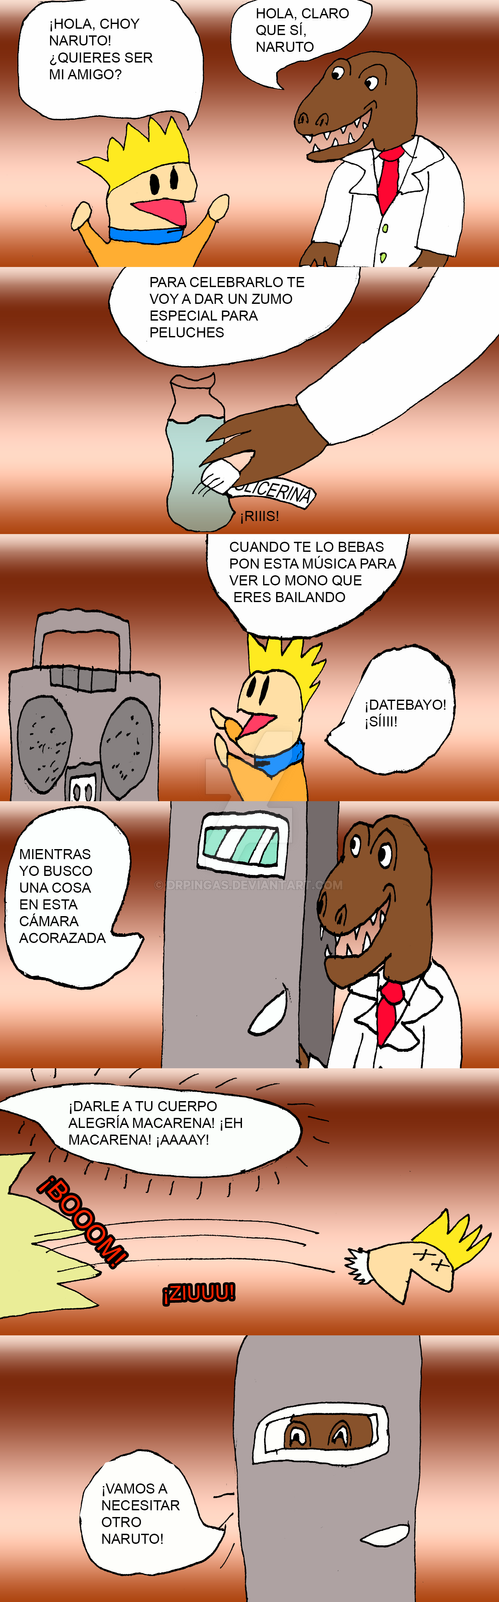 Otro naruto by DrPingas